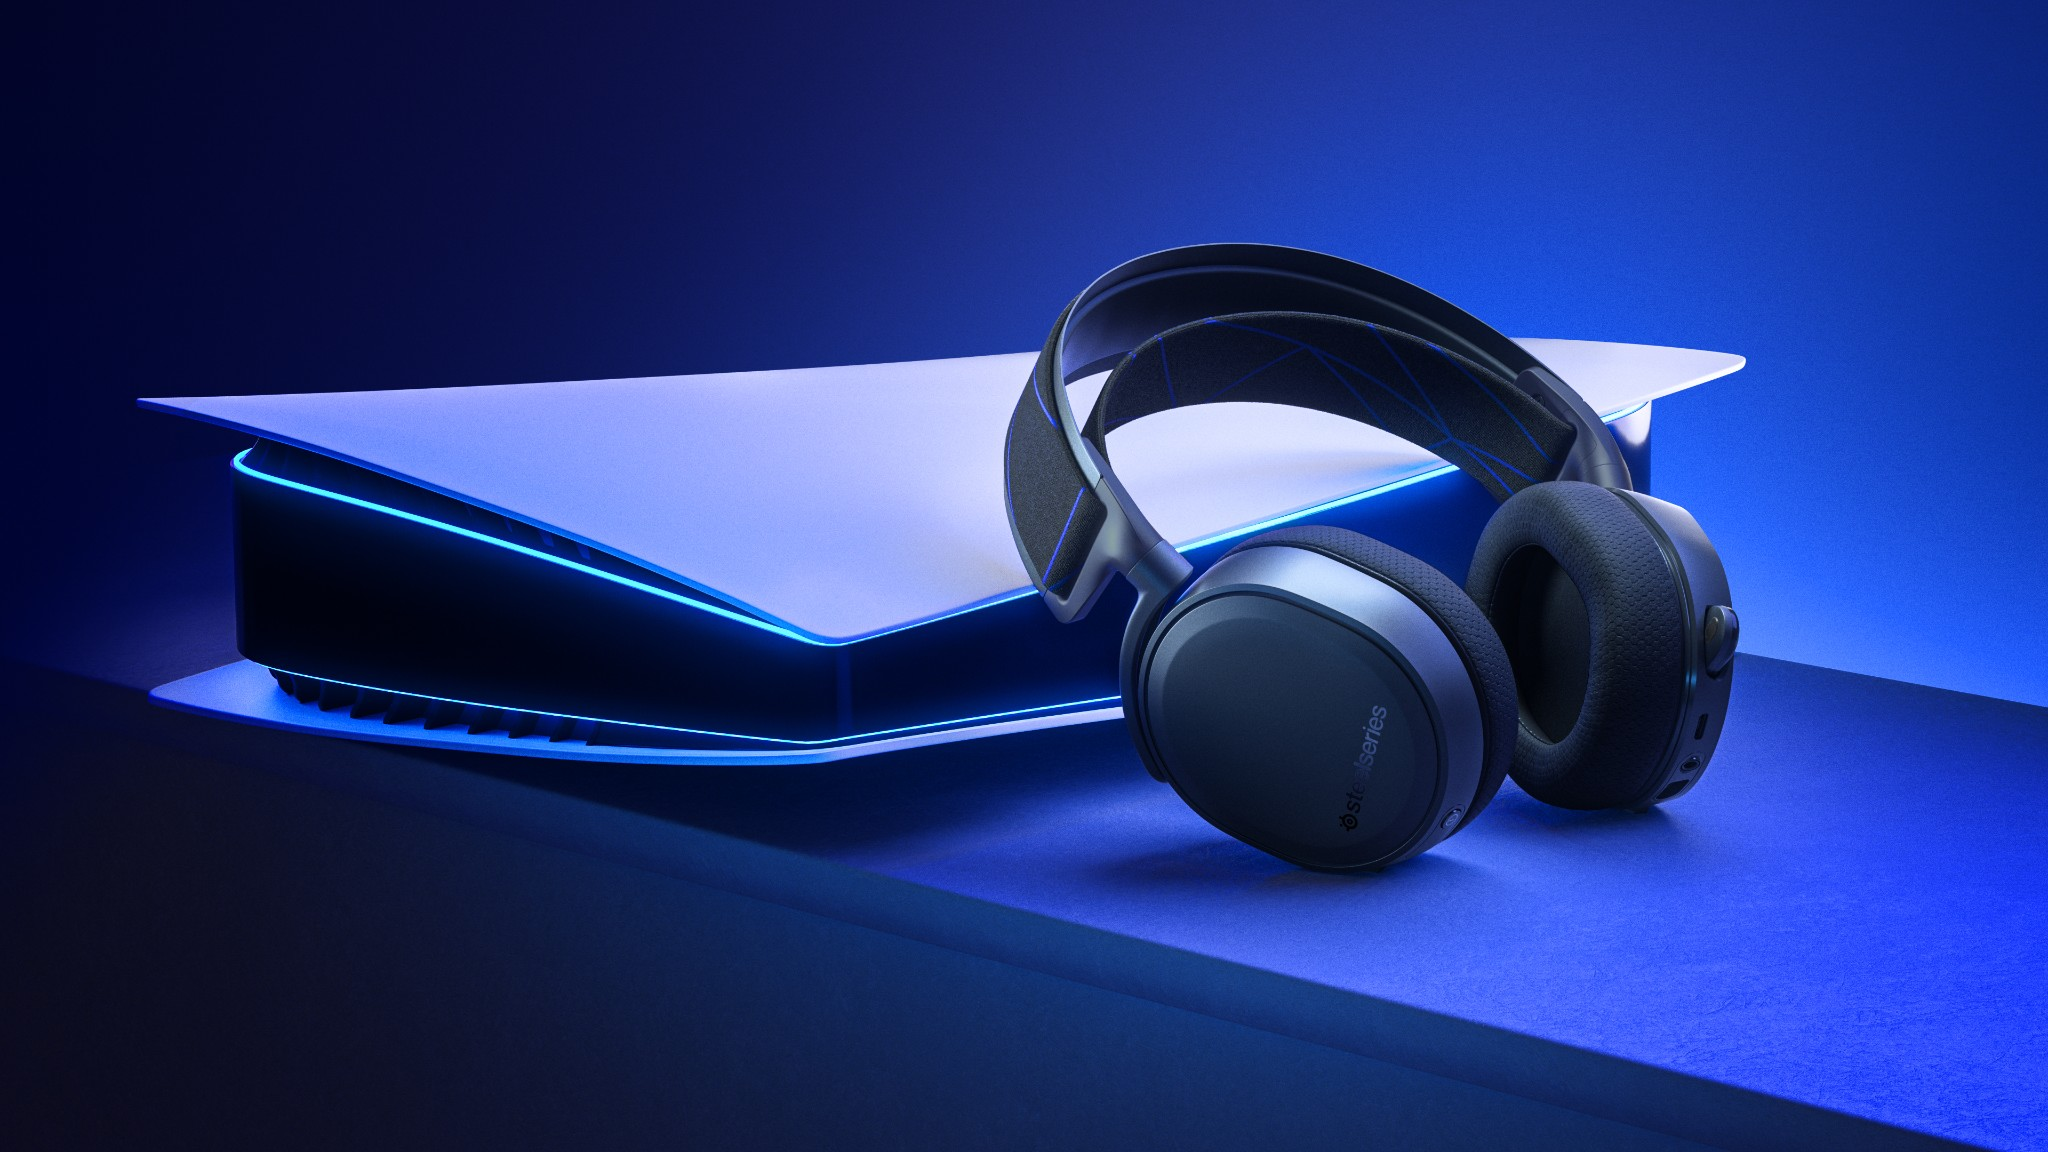 GEARVN.COM - Tai nghe SteelSeries Arctis 7P Black